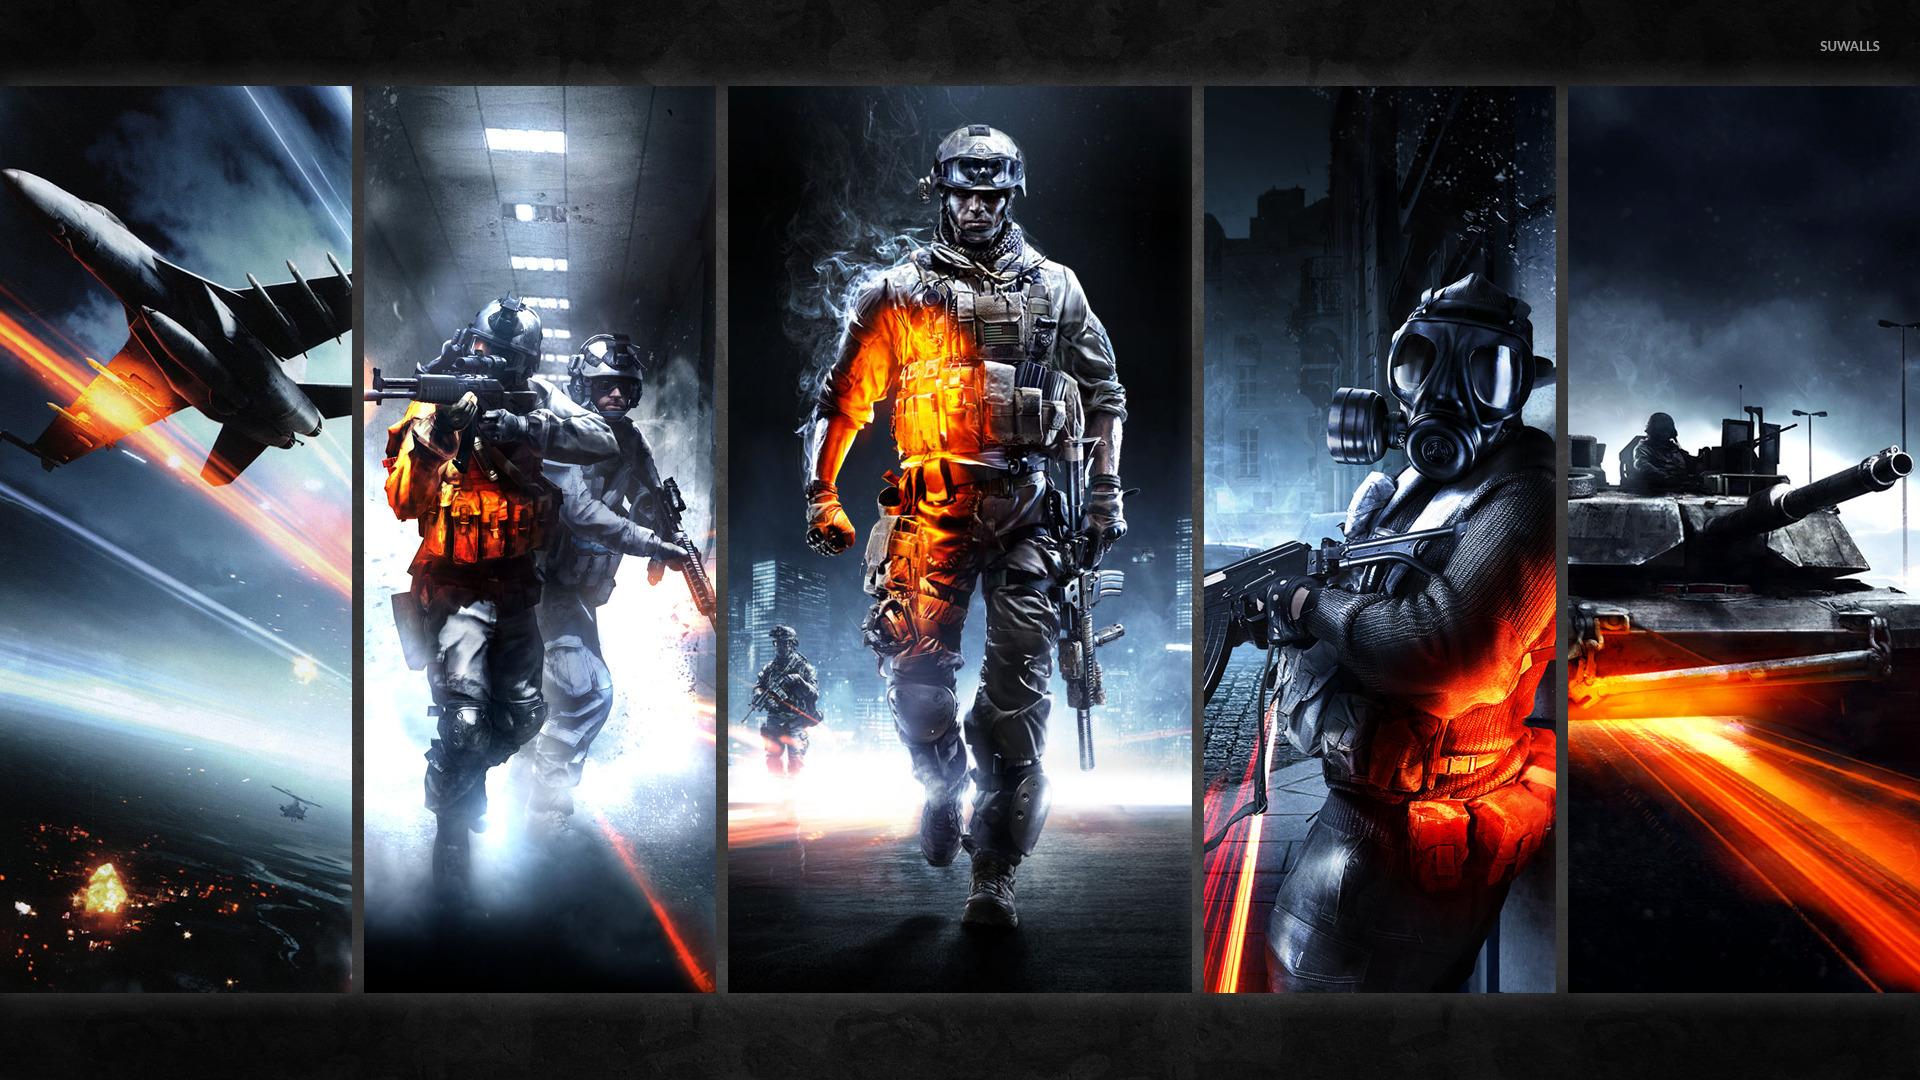 Battlefield 4 8 Wallpaper Game Wallpapers 21230